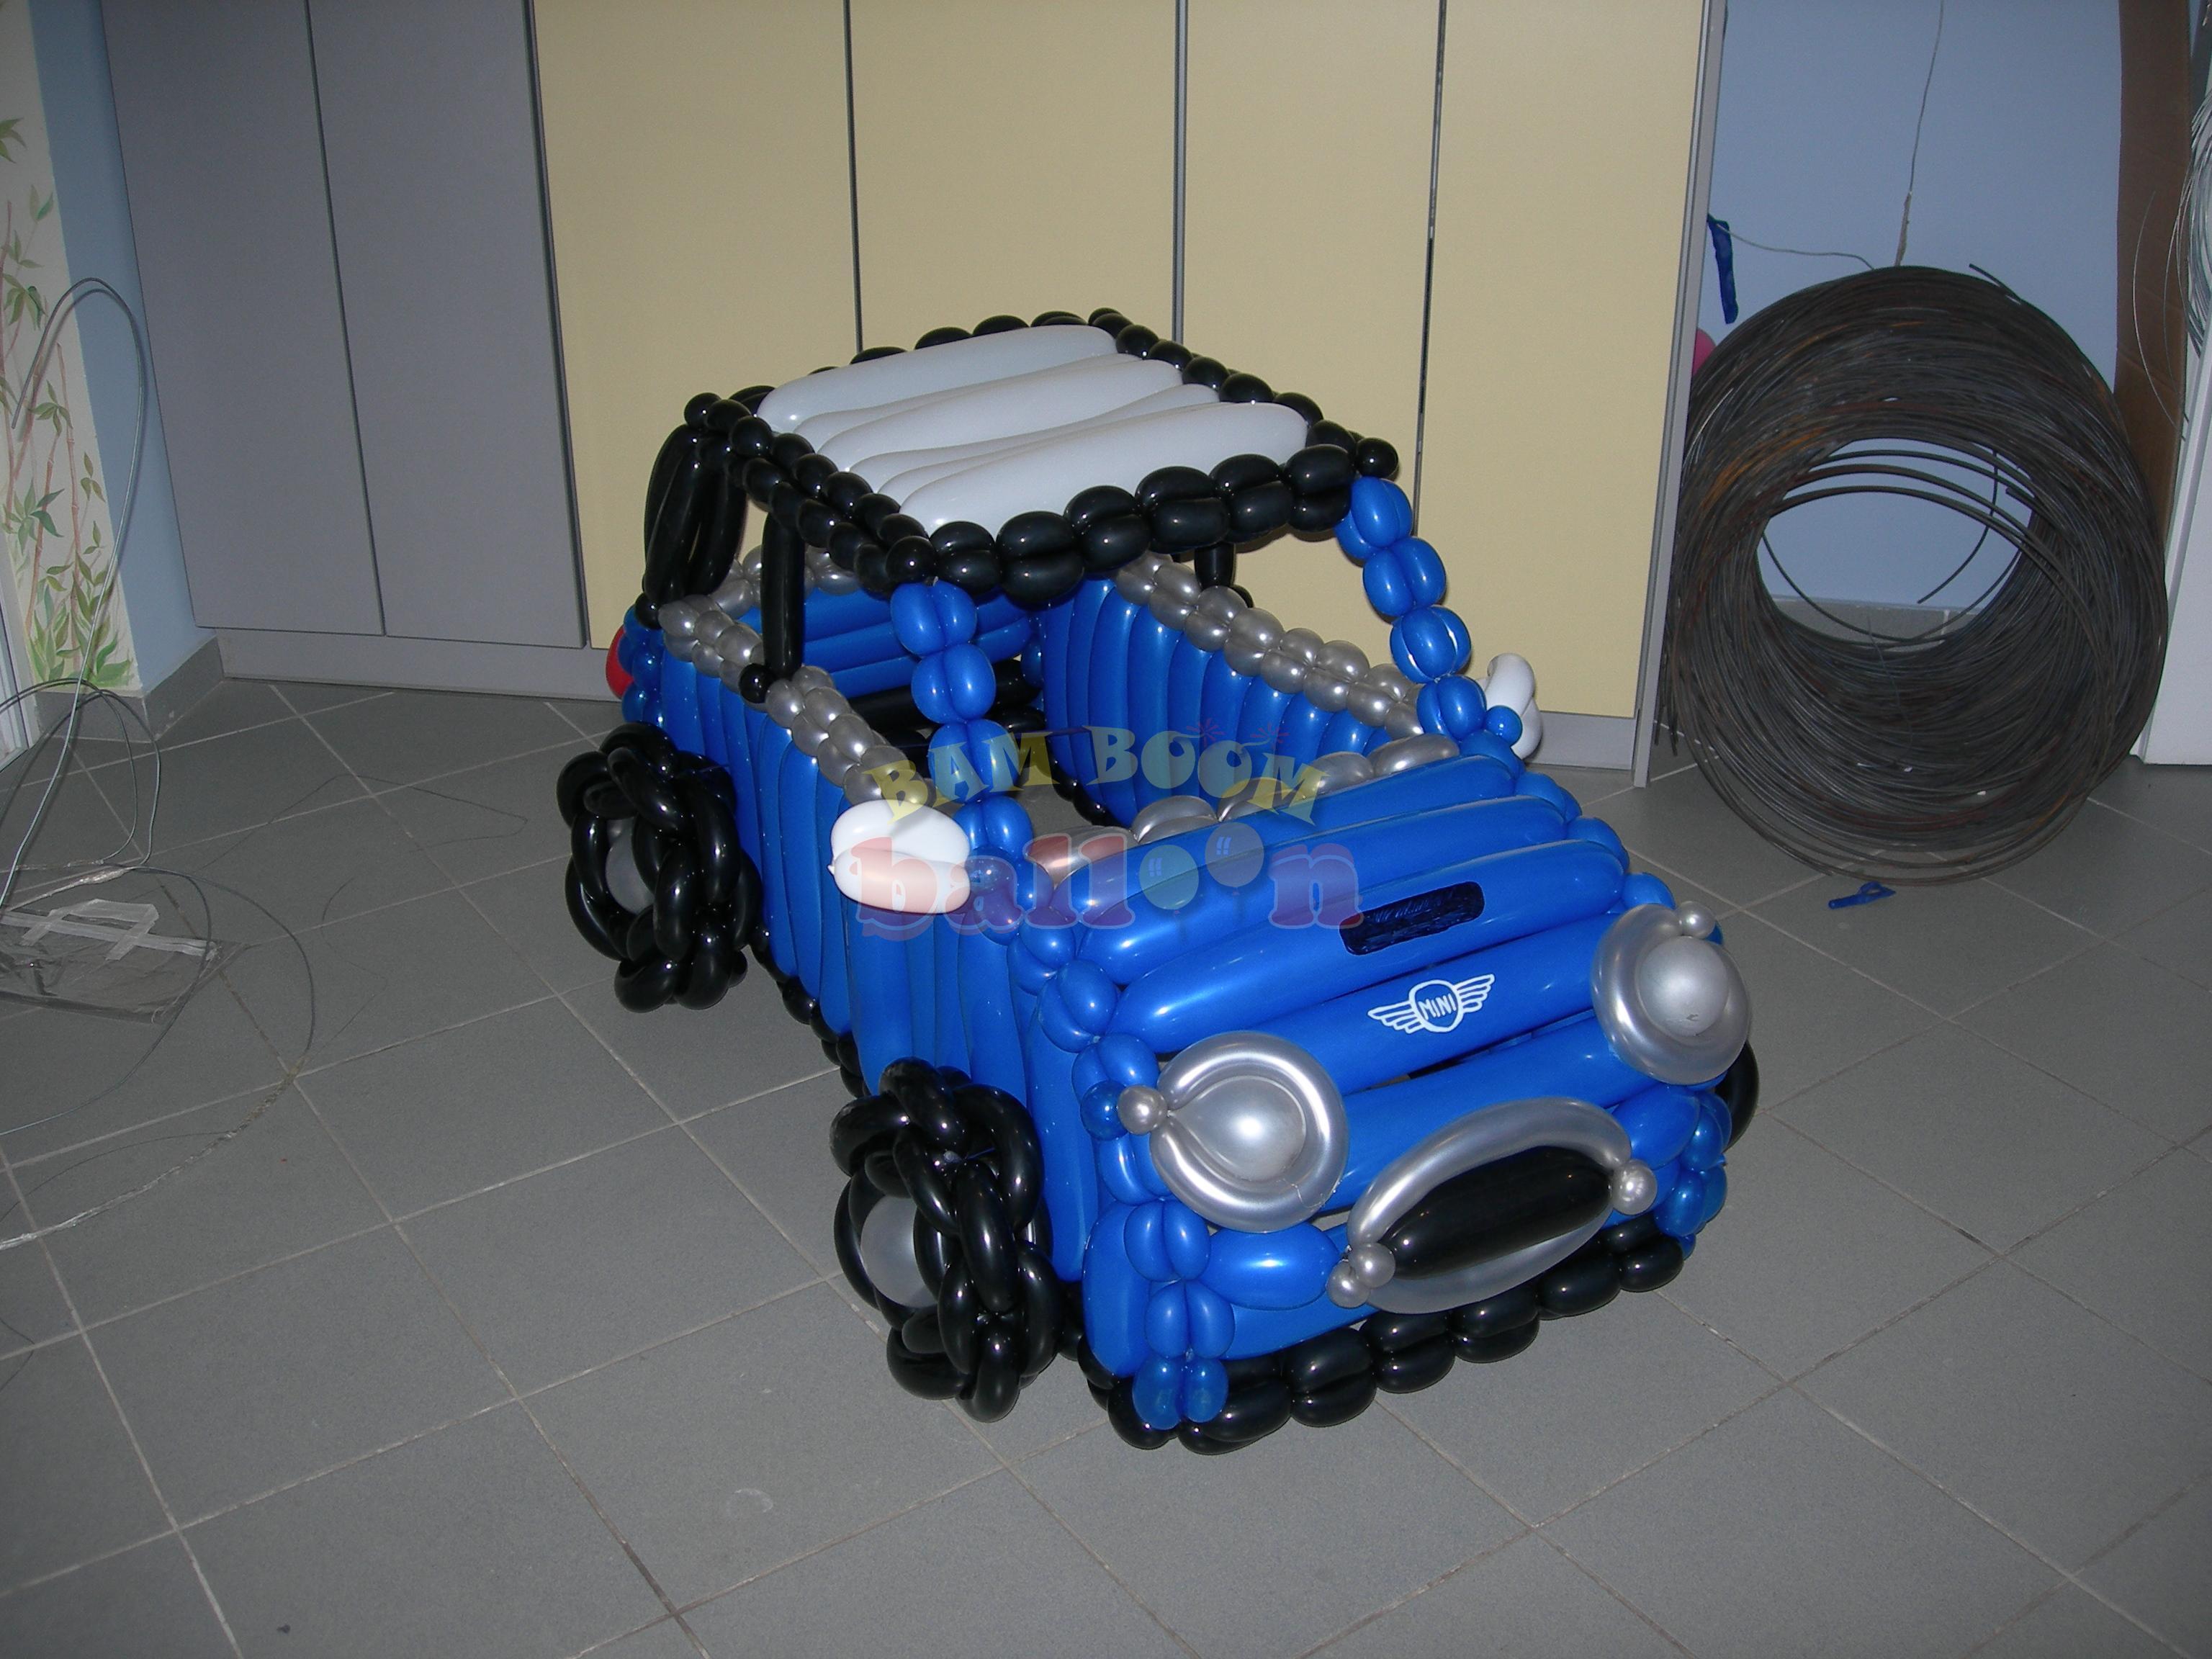 Jumbo αυτοκίνητο με μπαλόνια